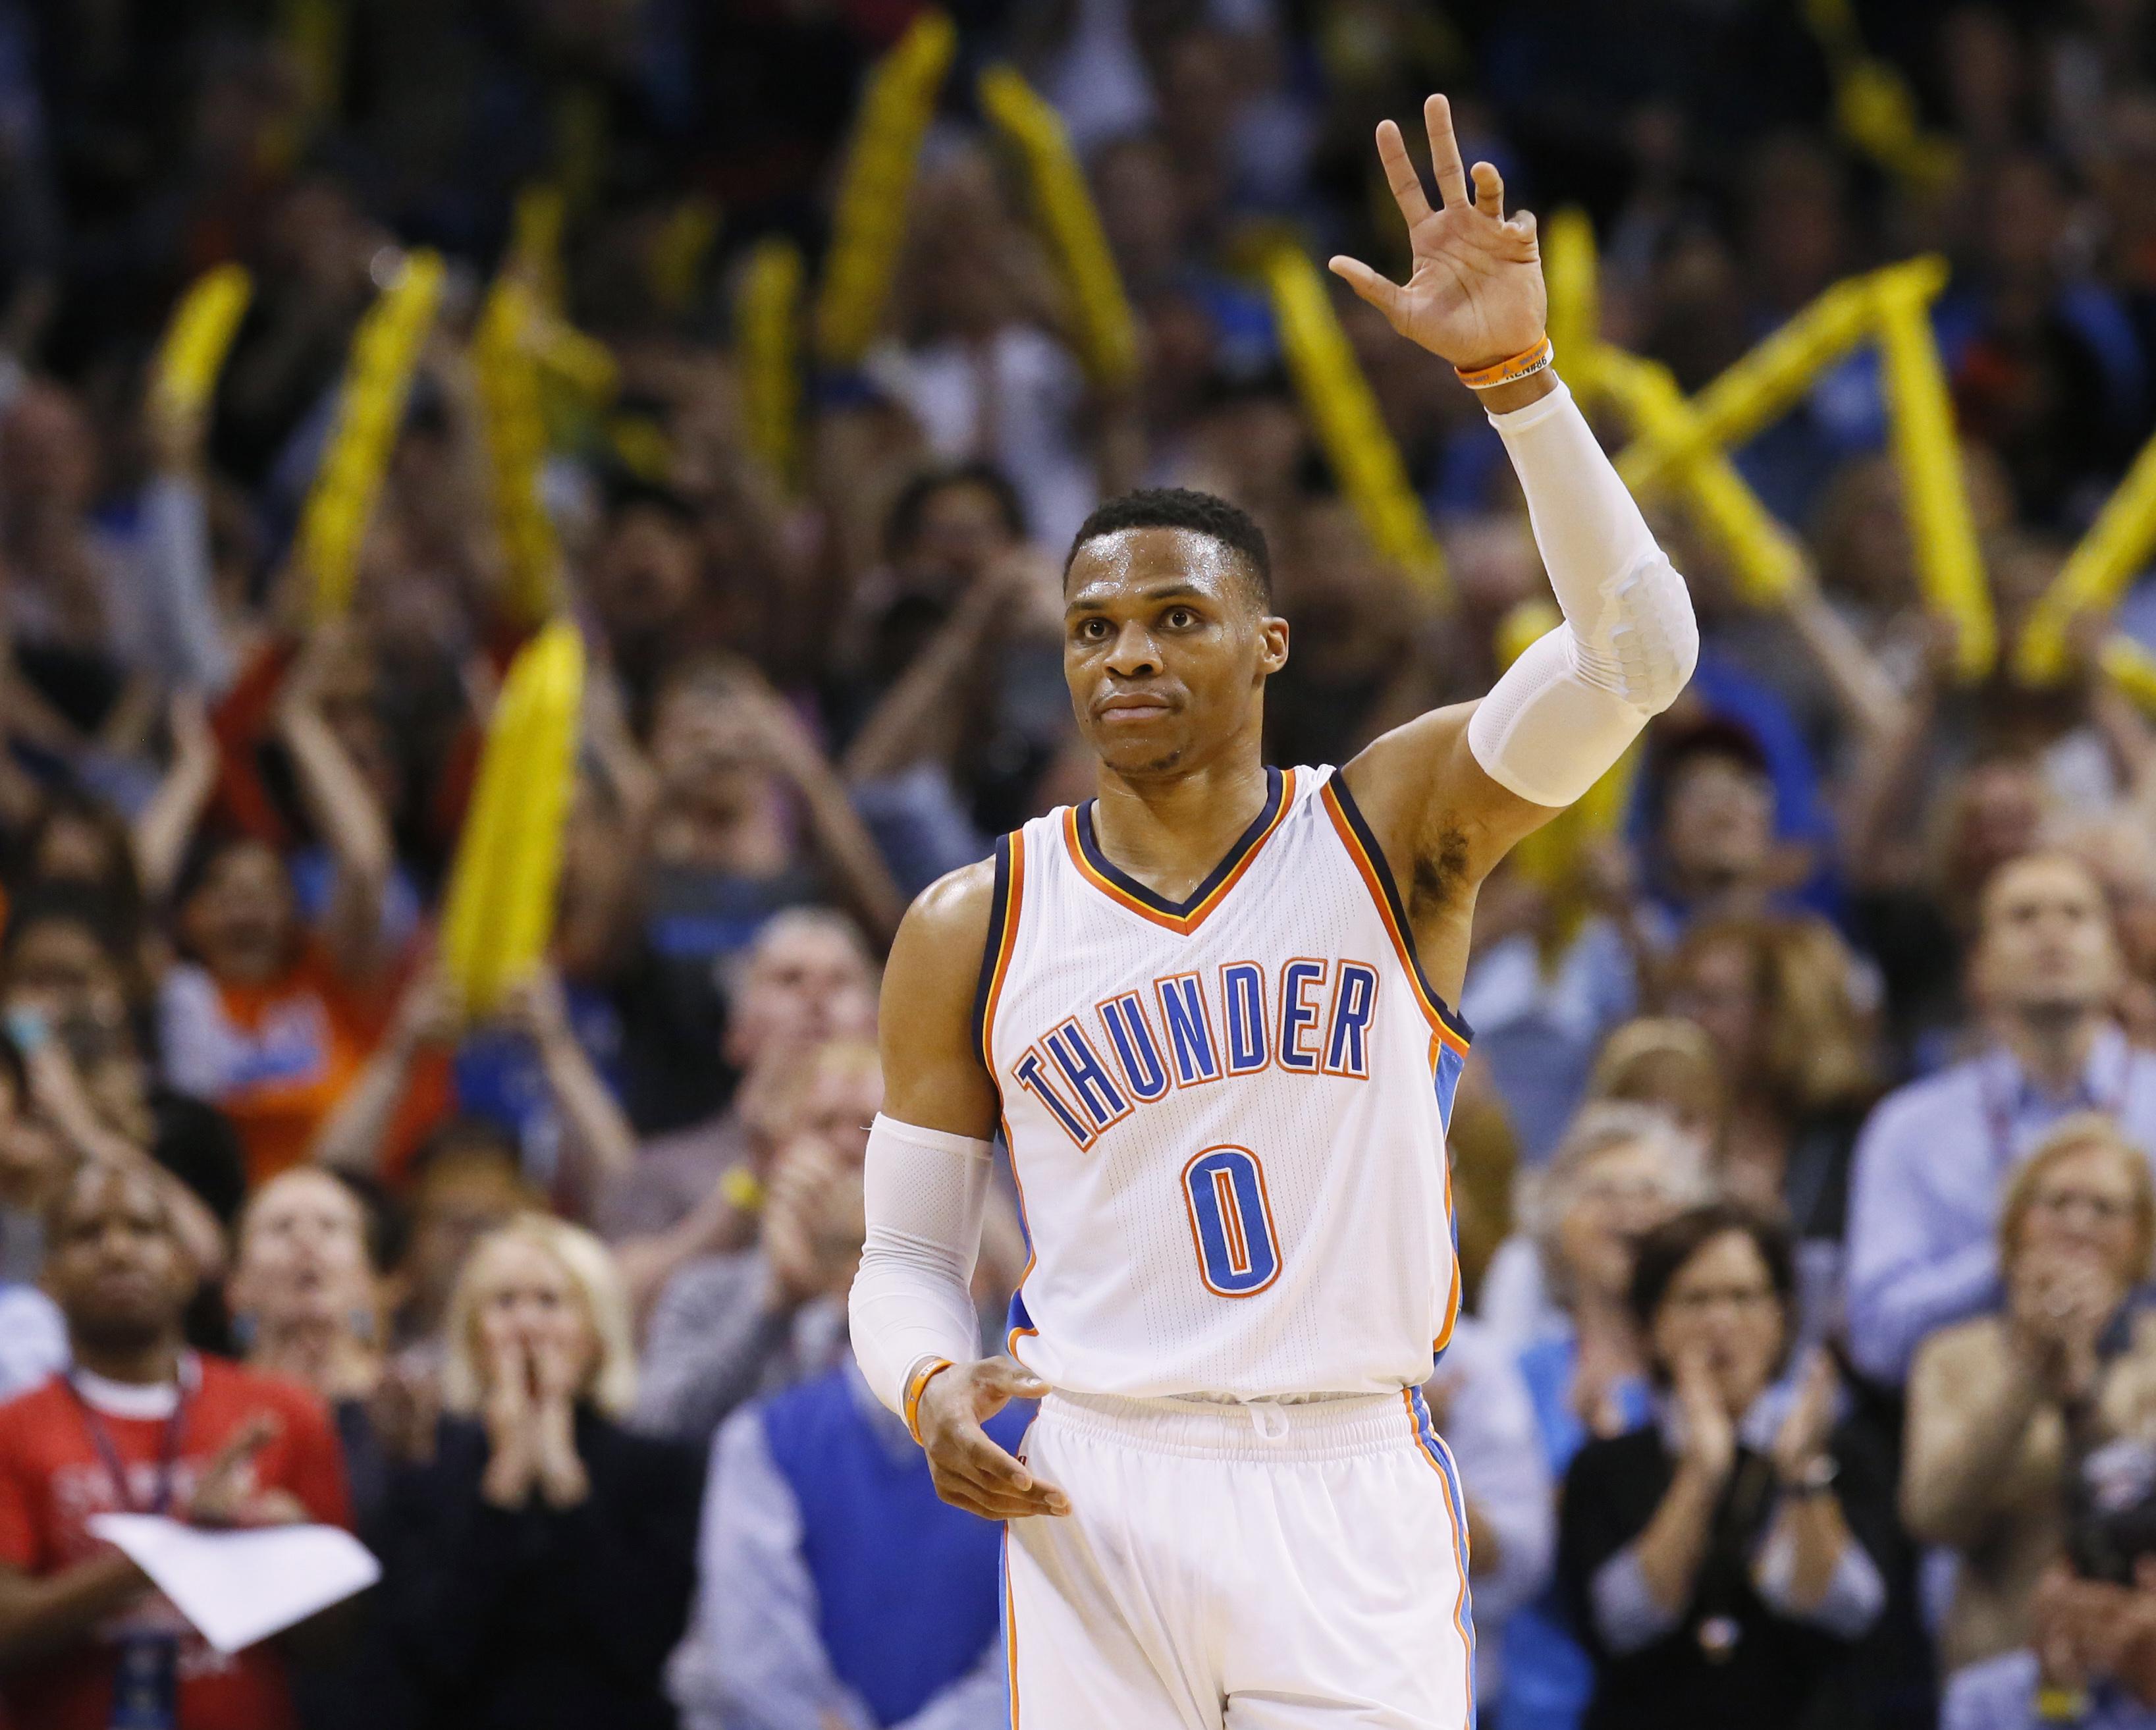 Russell Westbrook完成大三元平紀錄後,舉手向主場觀眾致意。(達志影像)